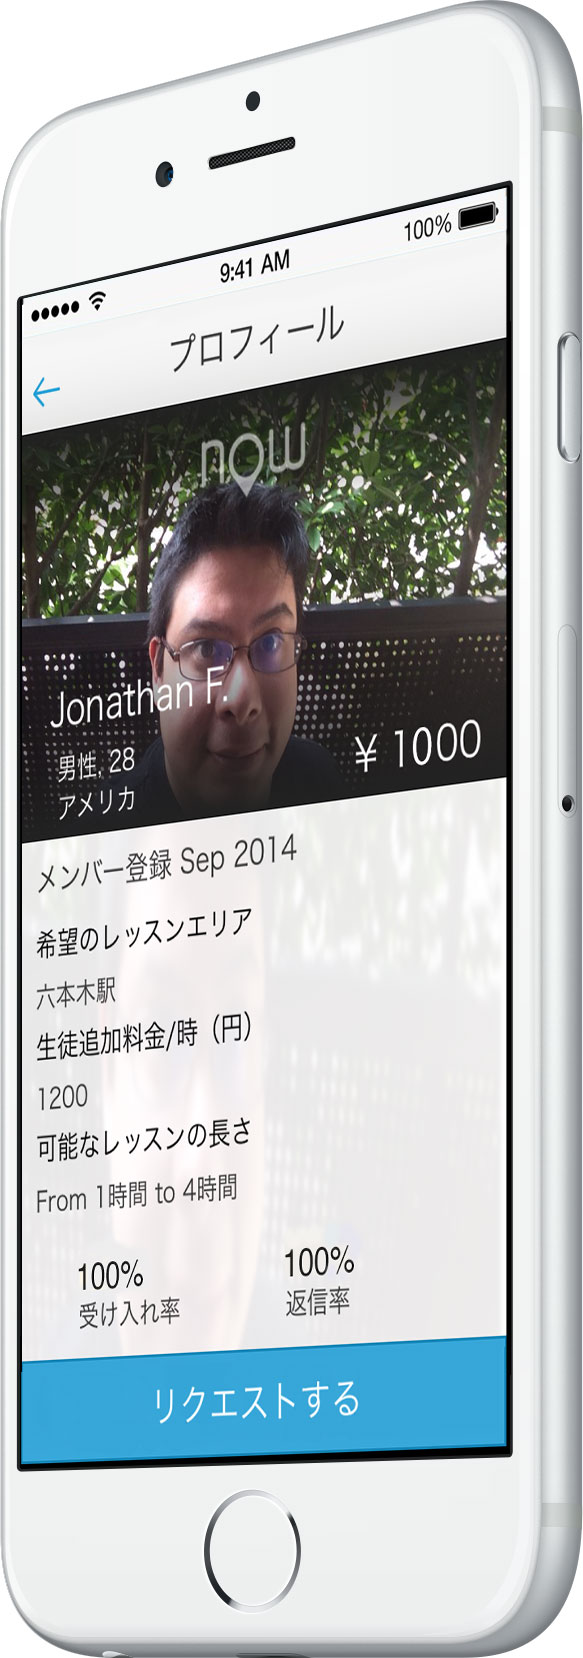 teacher_Jonathan_side.jpg